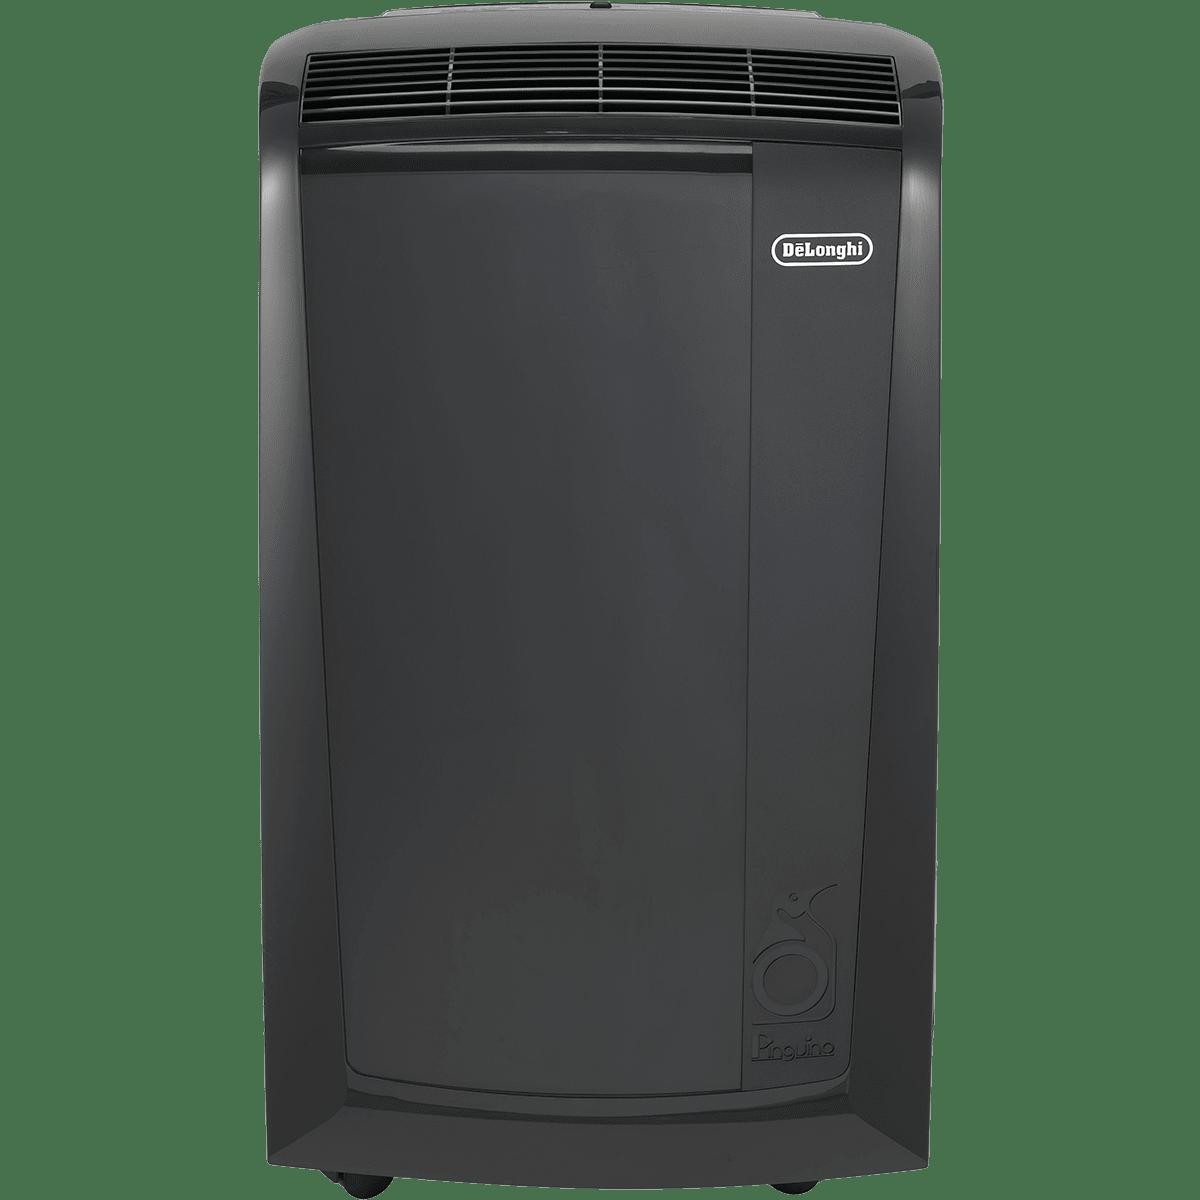 DeLonghi Pinguino N130HPE 13,000 BTU Portable Air Conditioner and Heater de2636